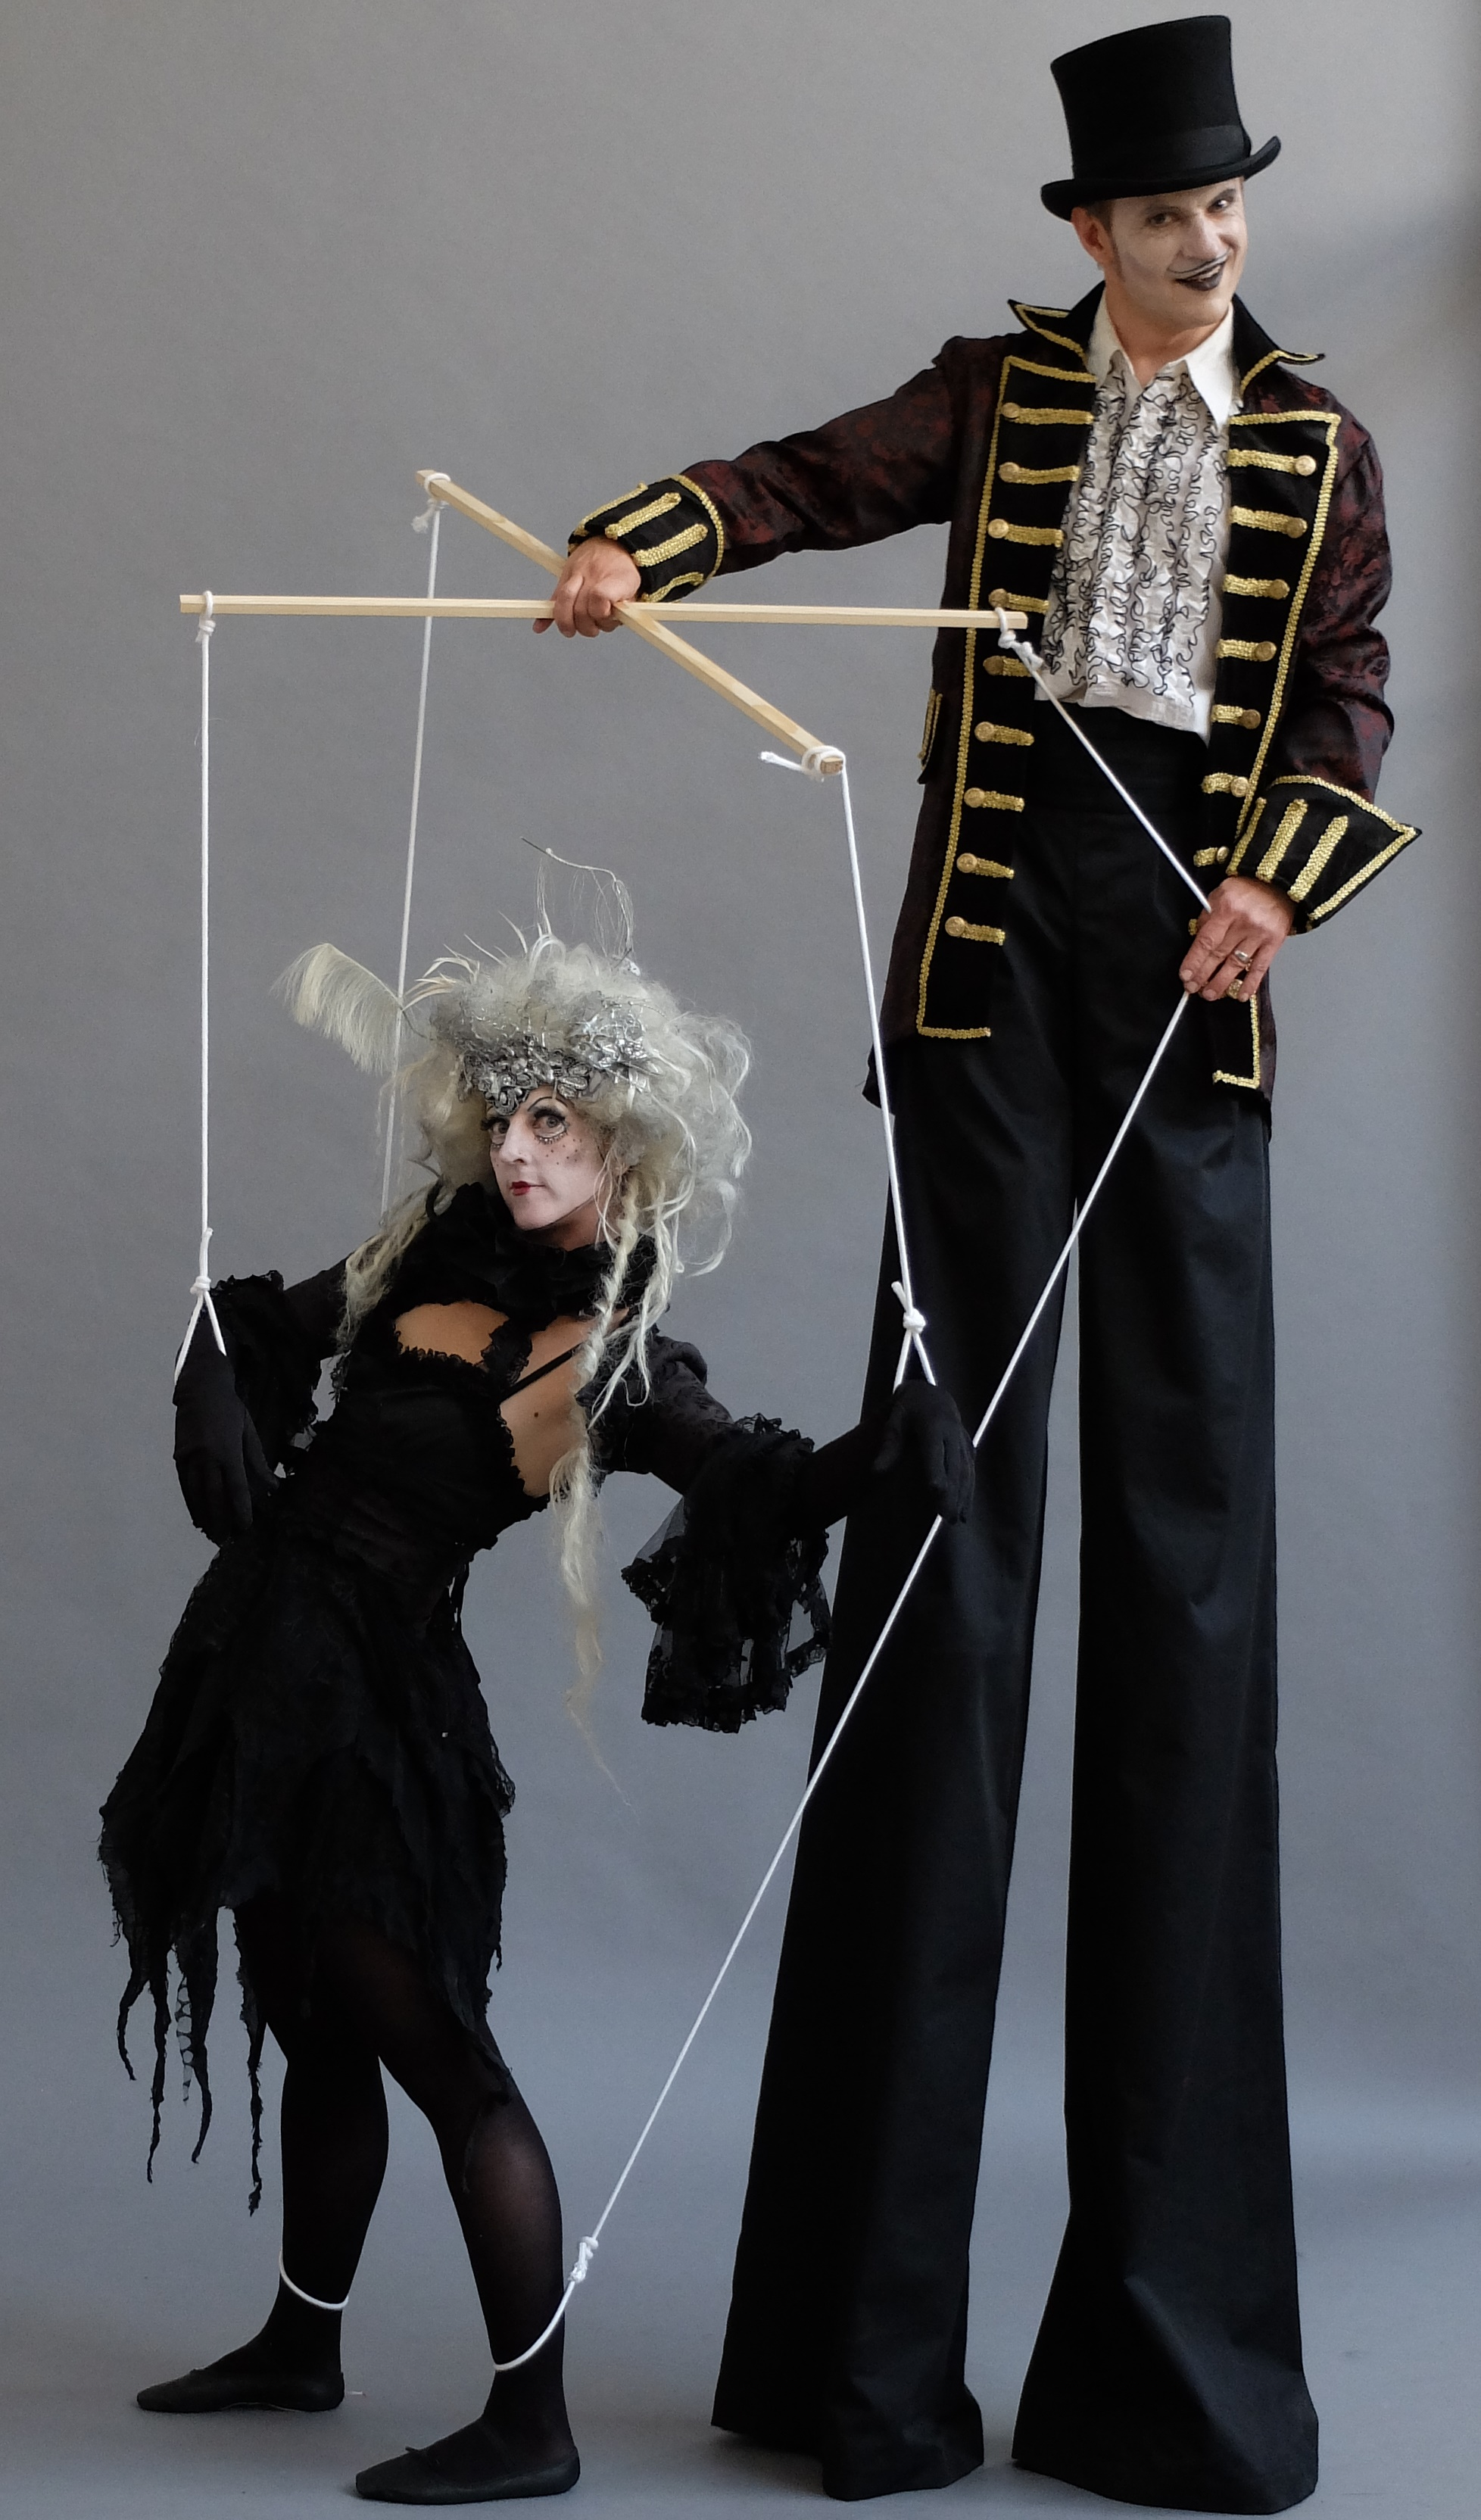 Marionette Puppet Master Halloween